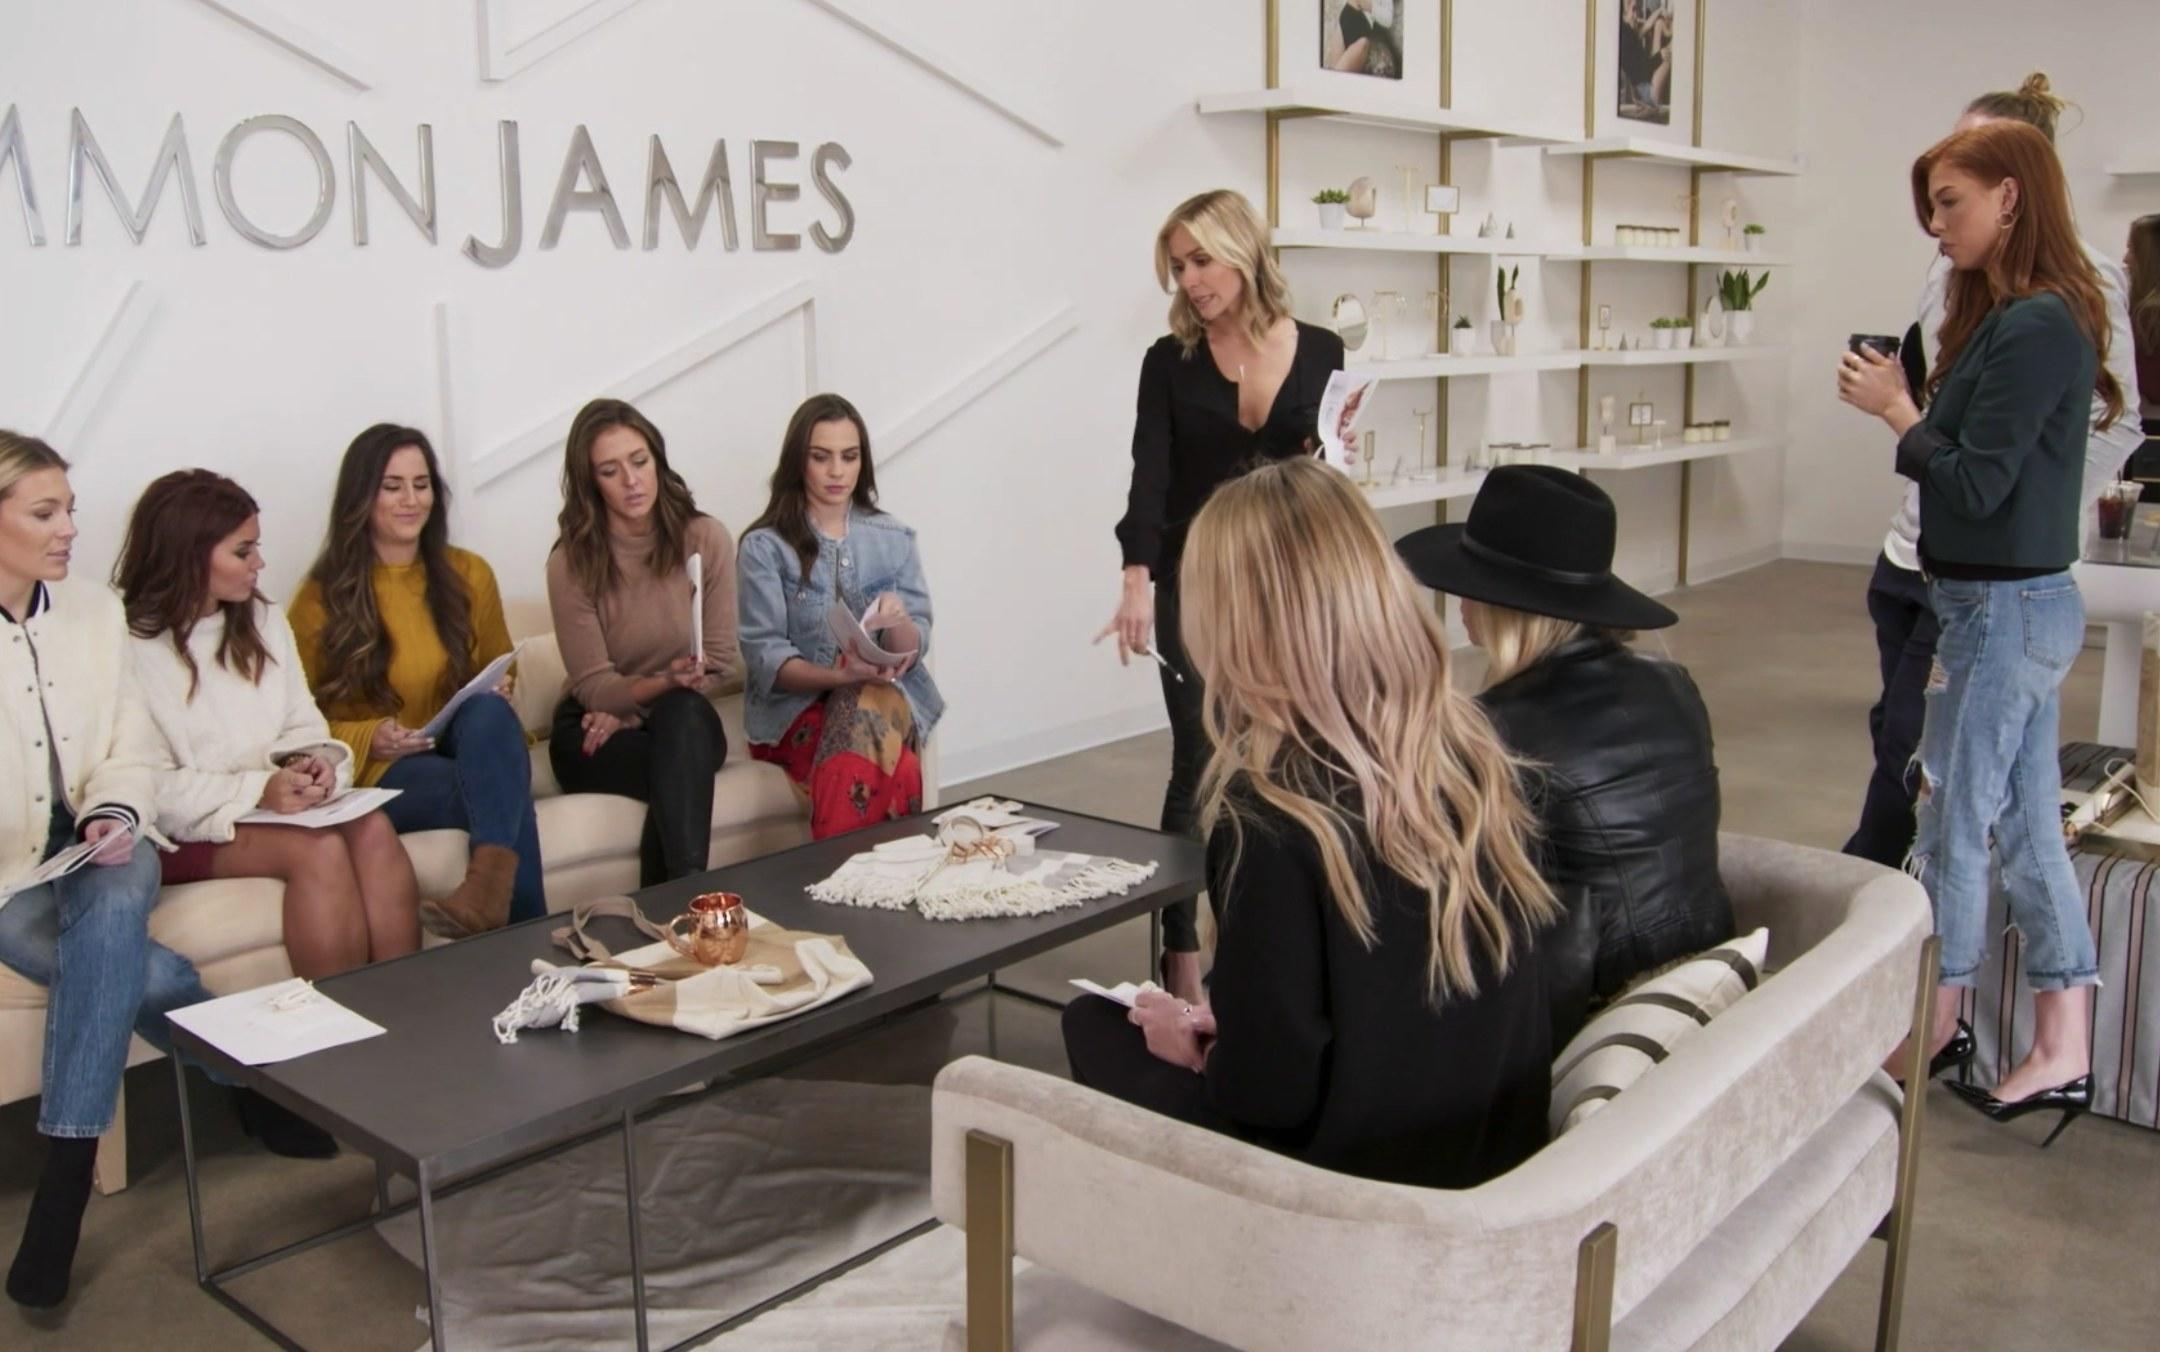 Kristin Cavallari has a team meeting at her store Uncommon James